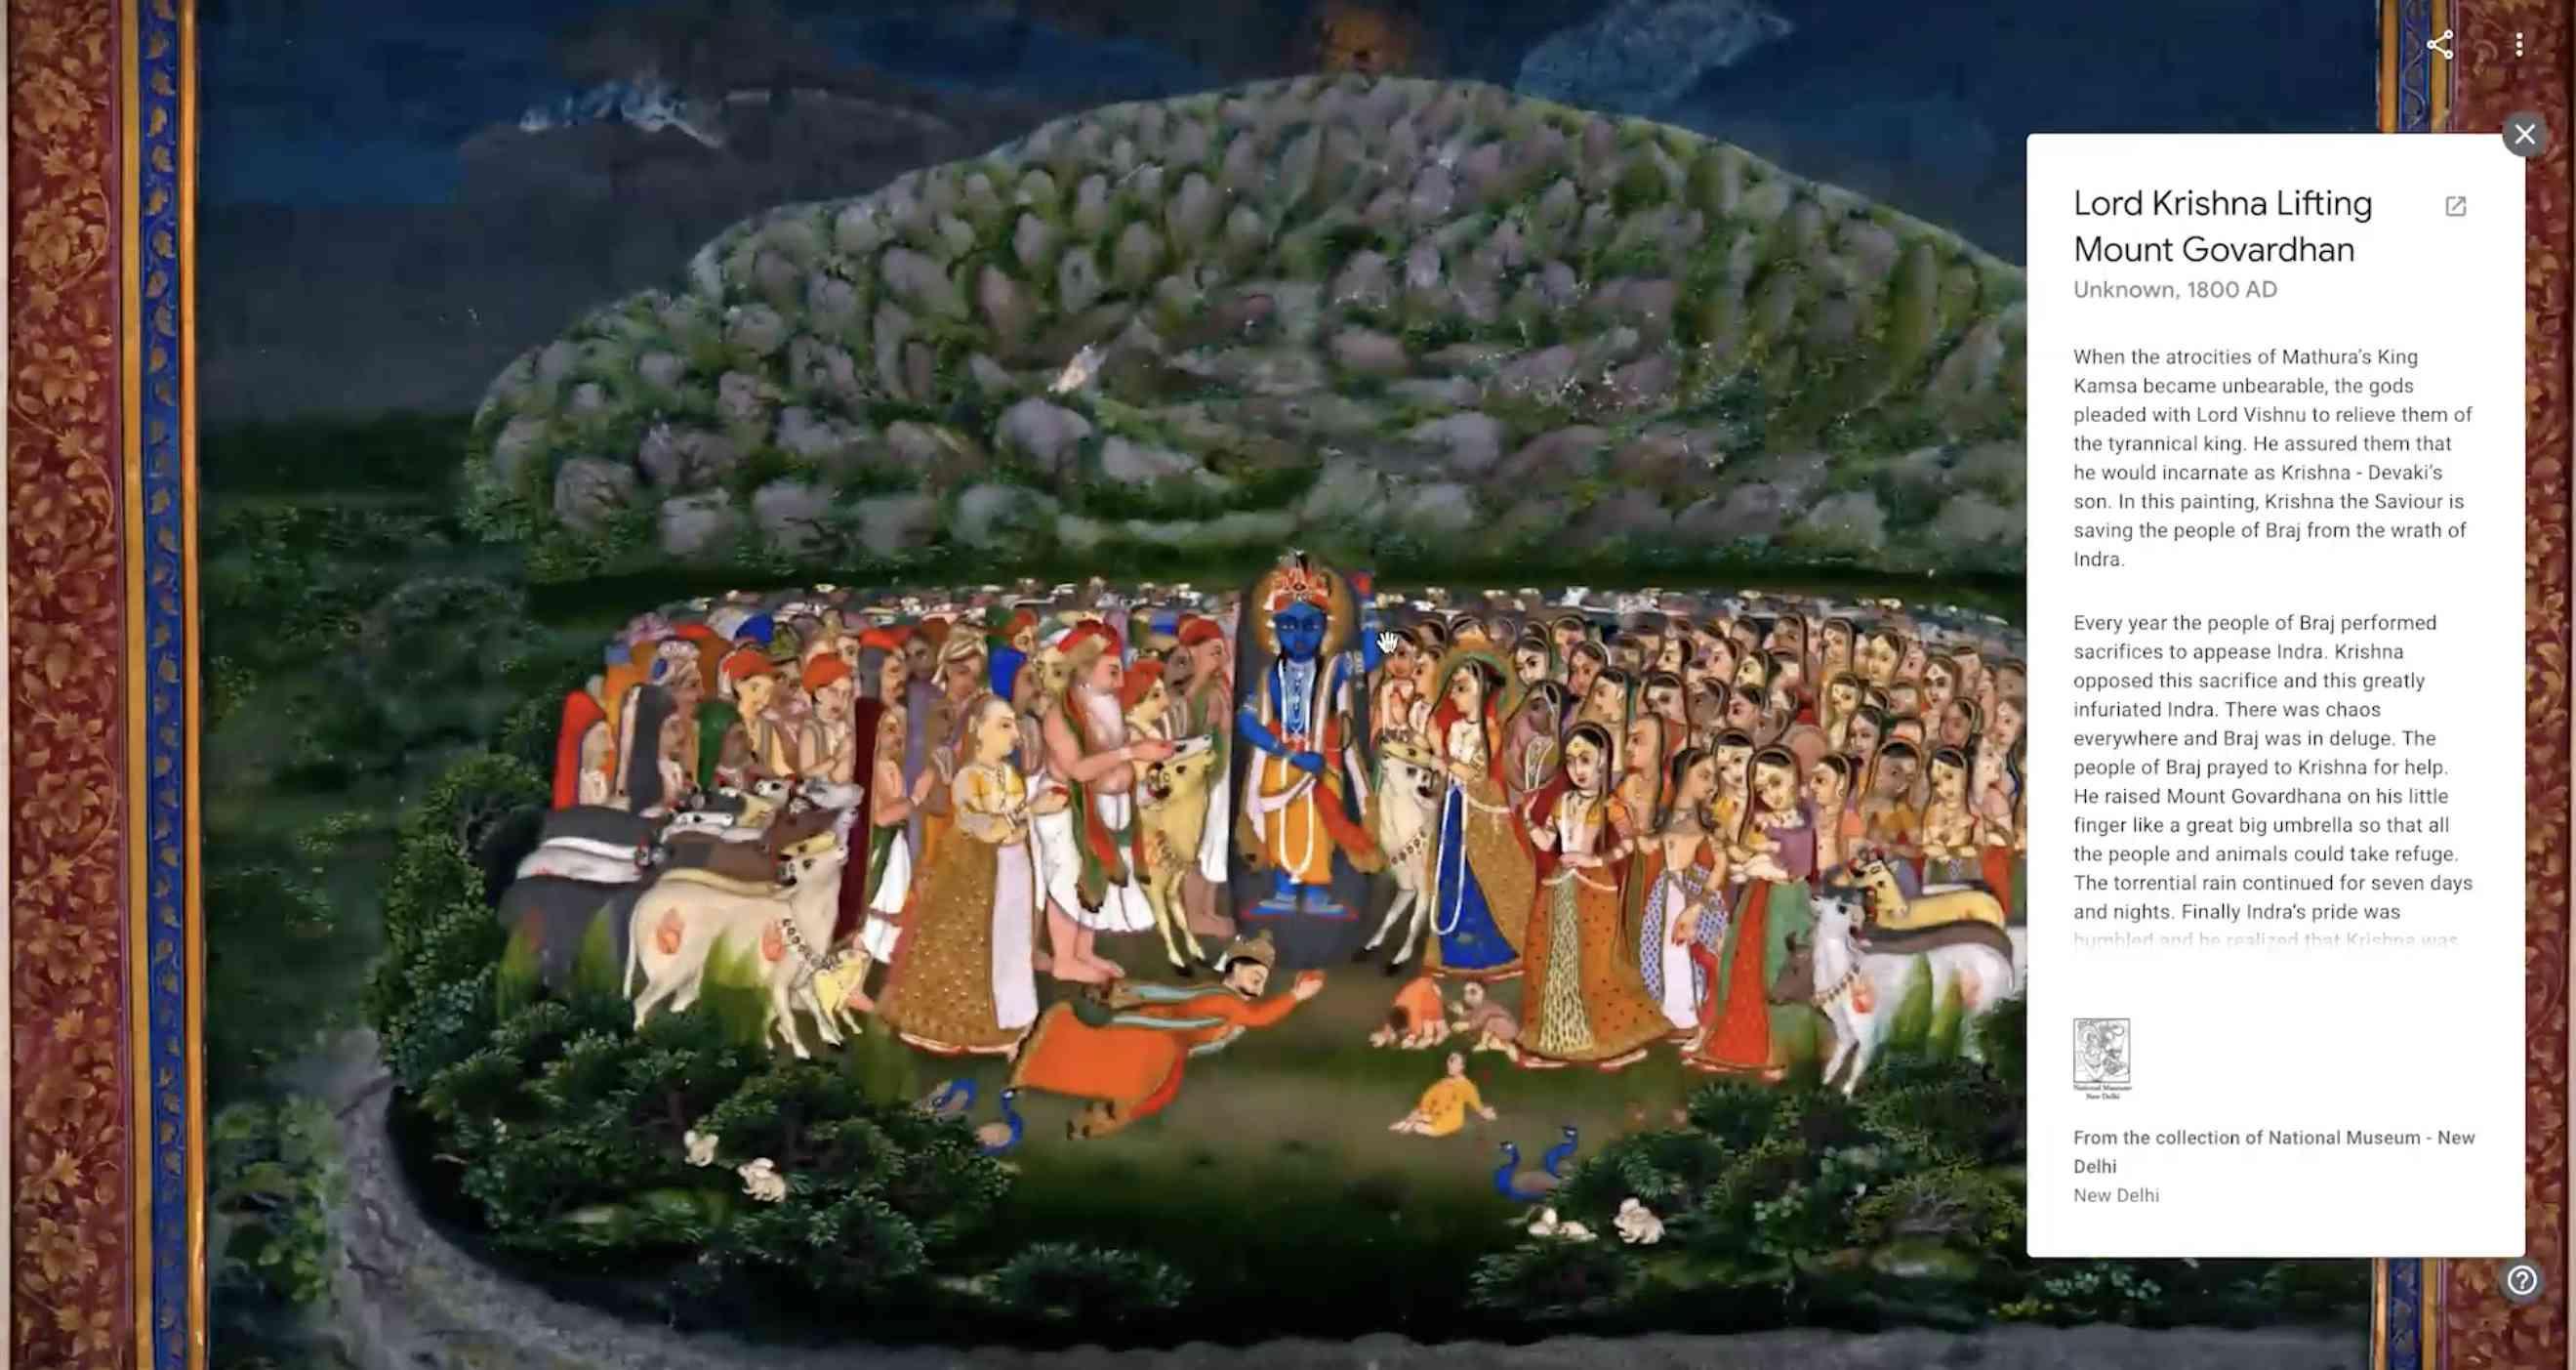 Pocket Gallery - Lord Krishna Lifting Mount Govardhan